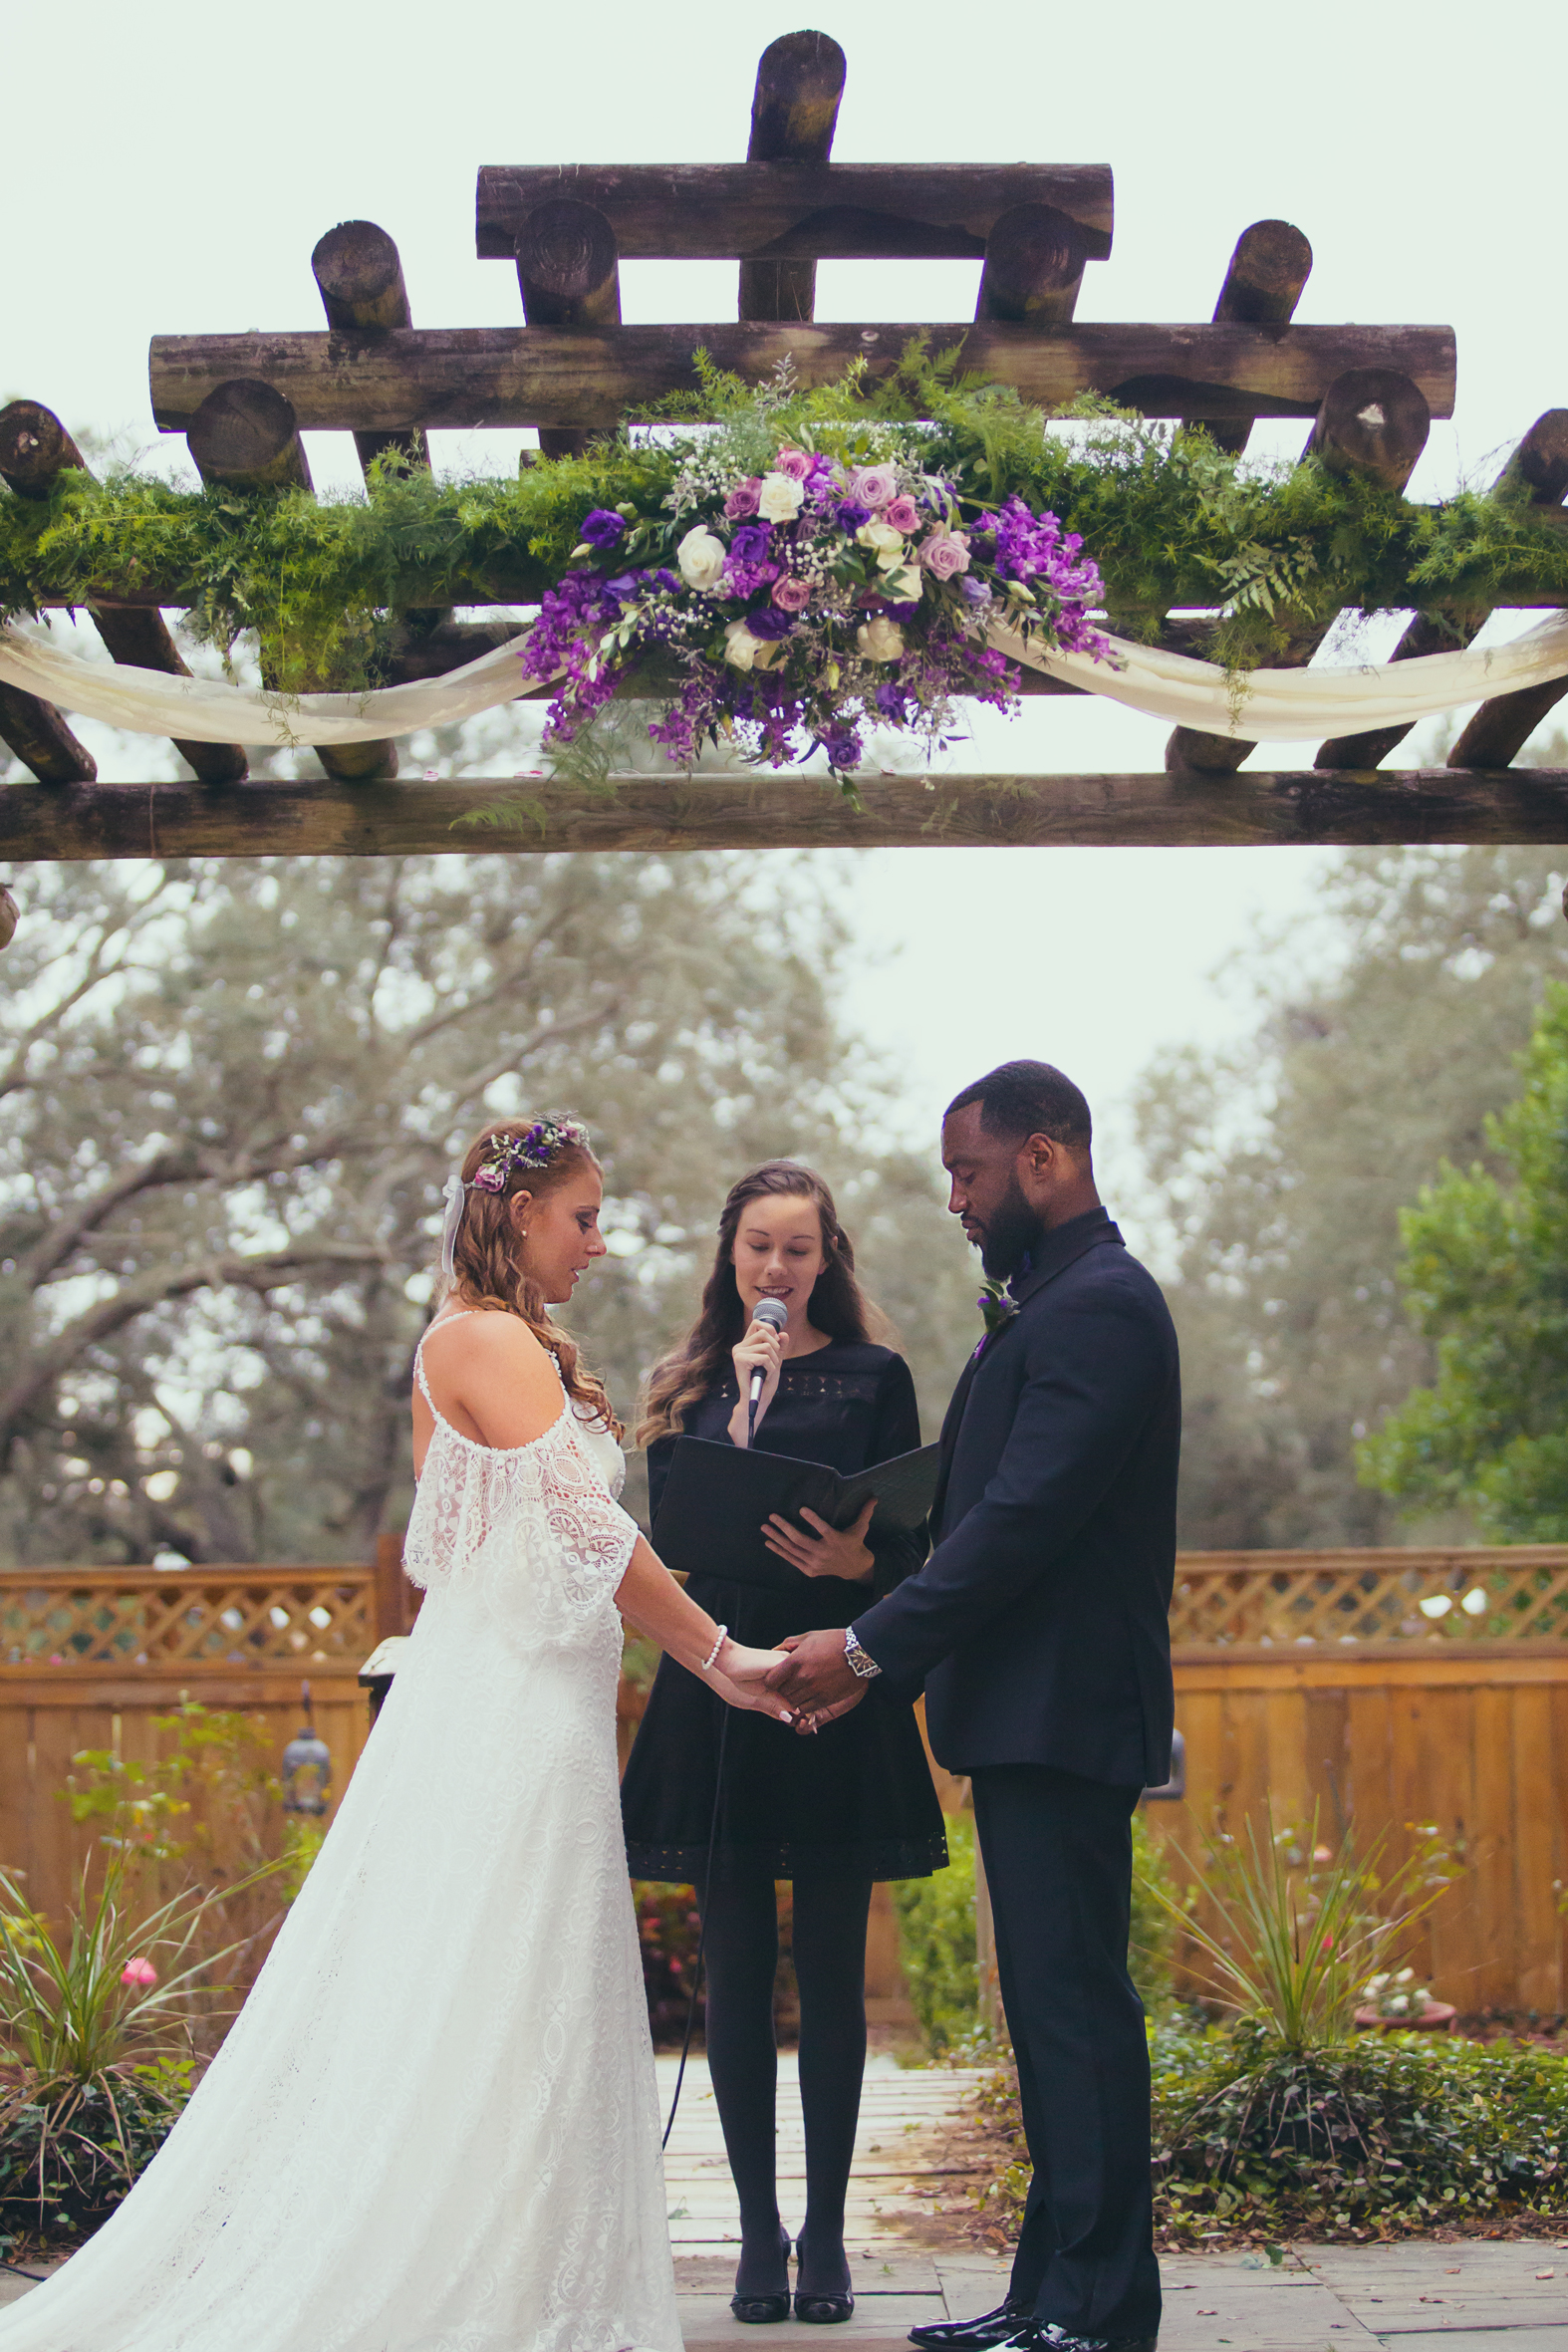 harmony-gardens-wedding-chamber-photography-moments-antoine-hart-5.jpg